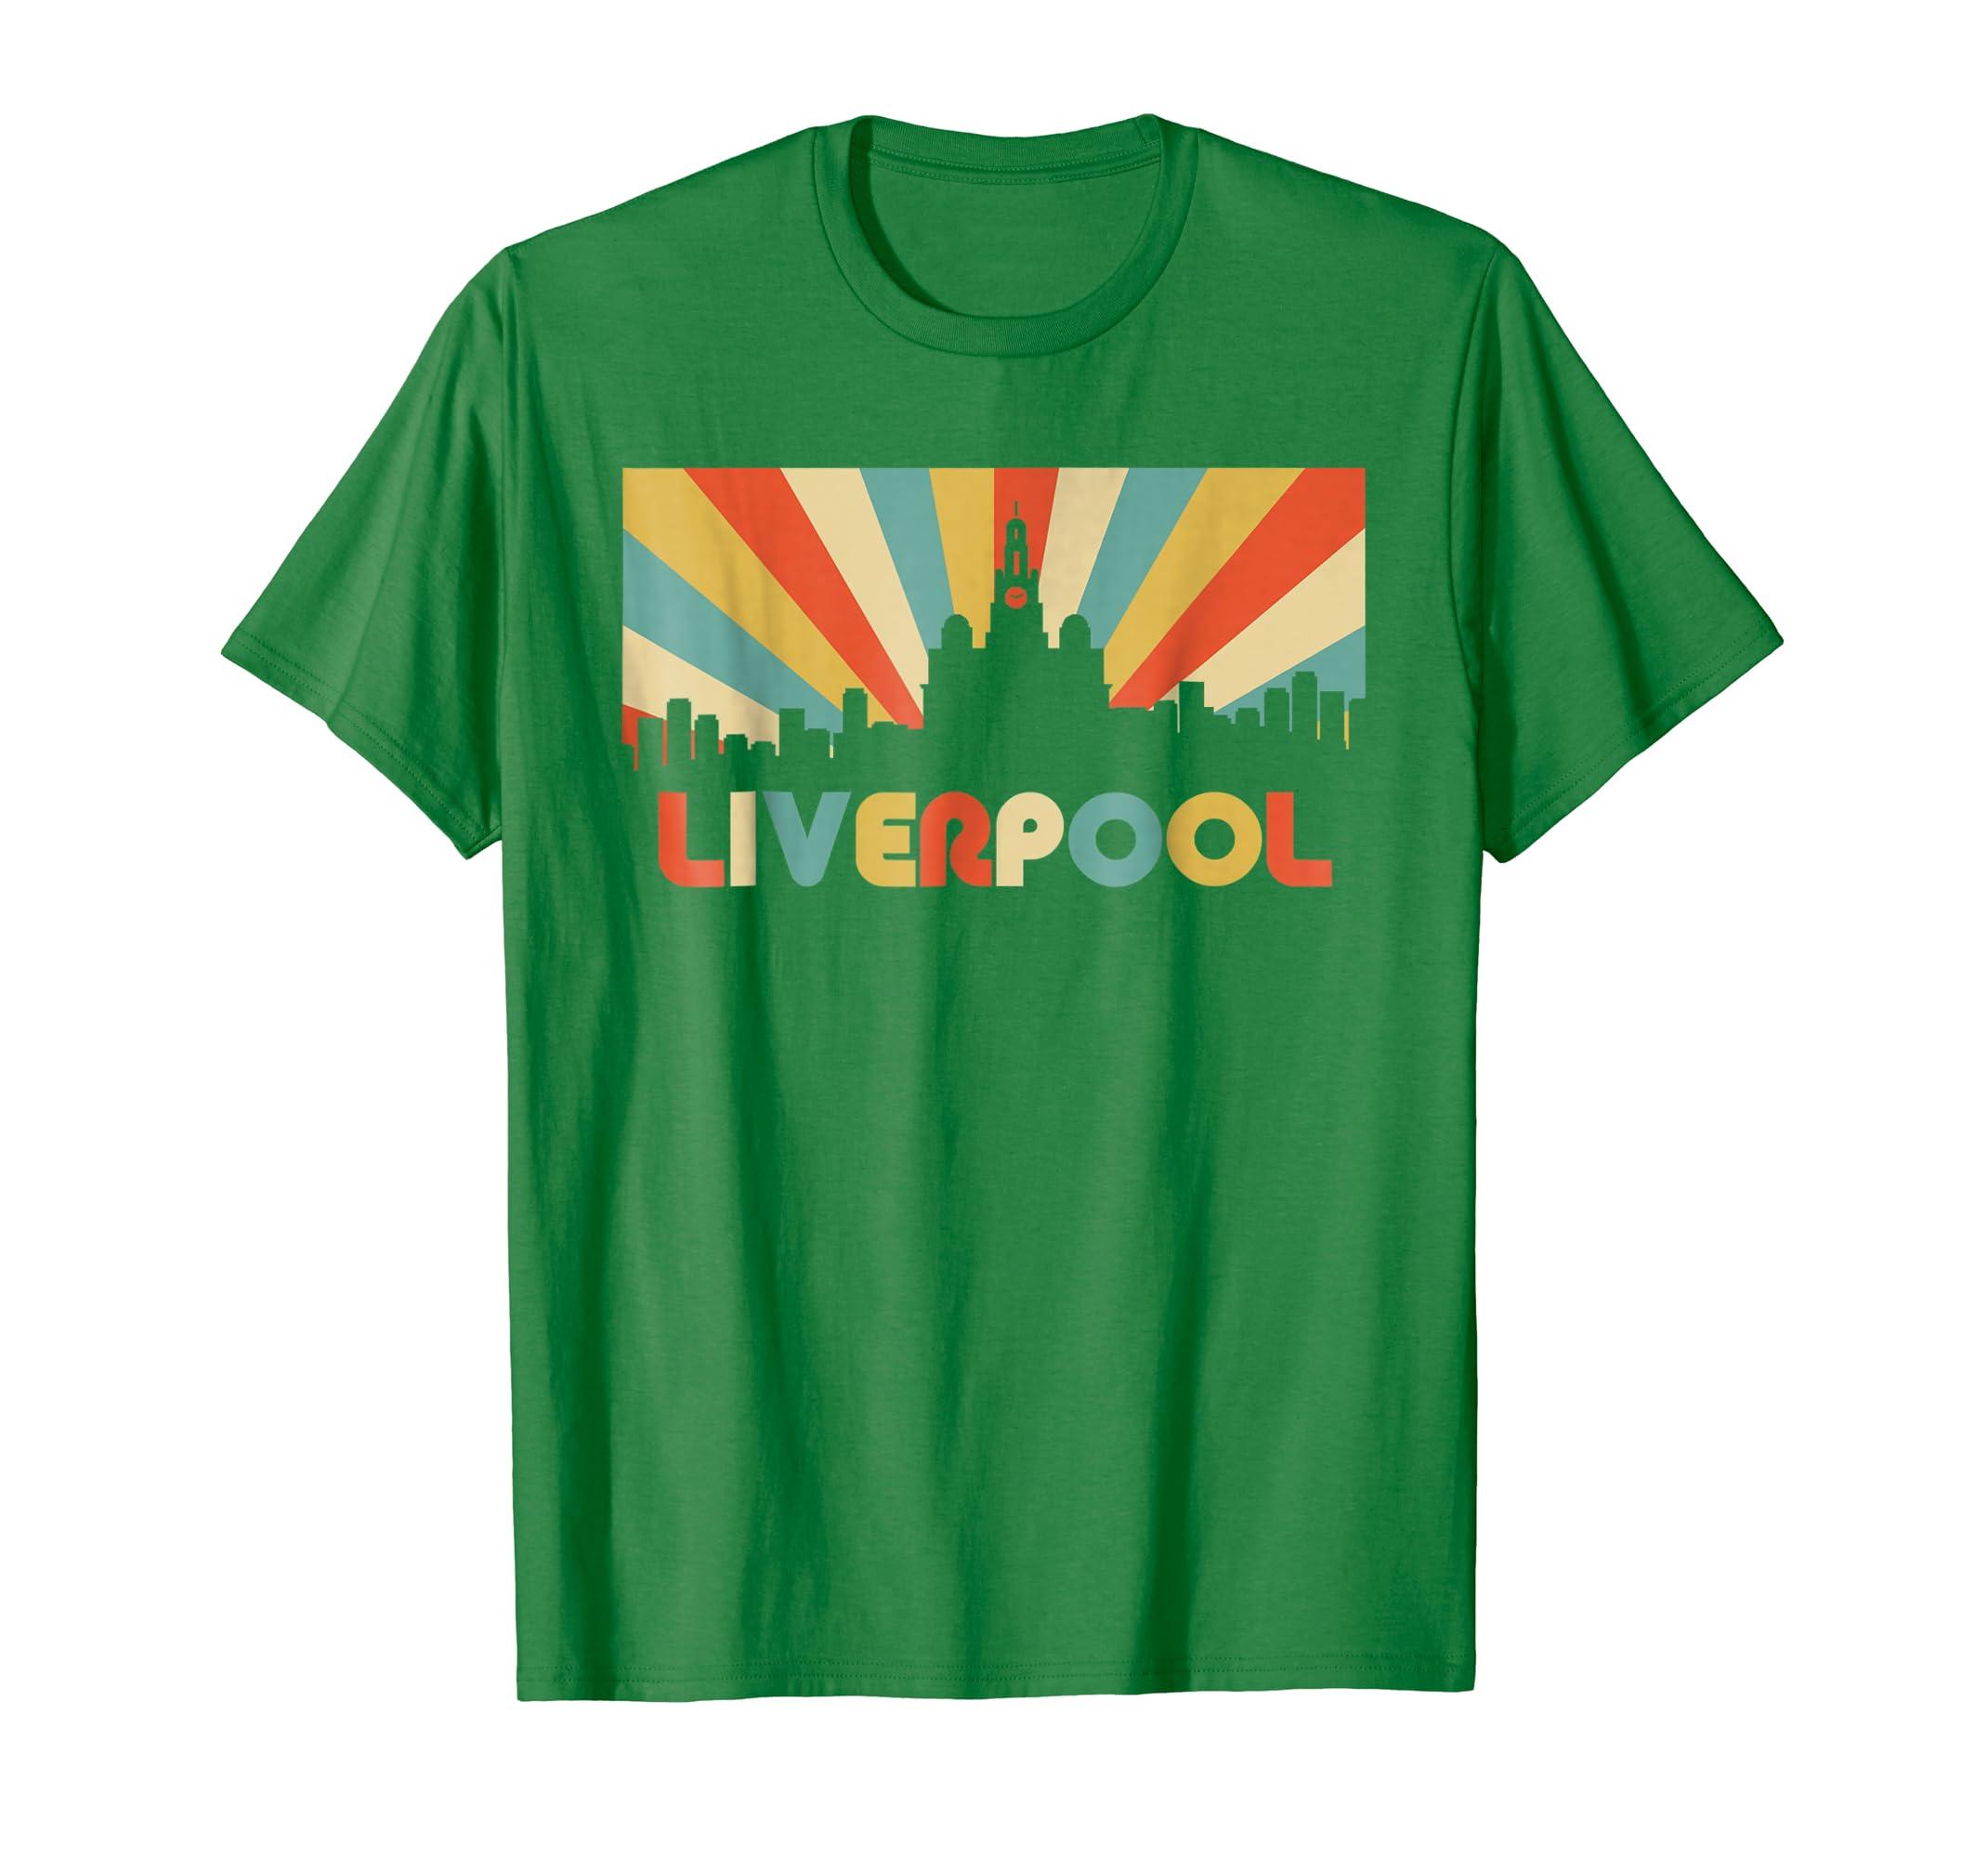 bfaef735 Cheap Retro England Shirts - DREAMWORKS